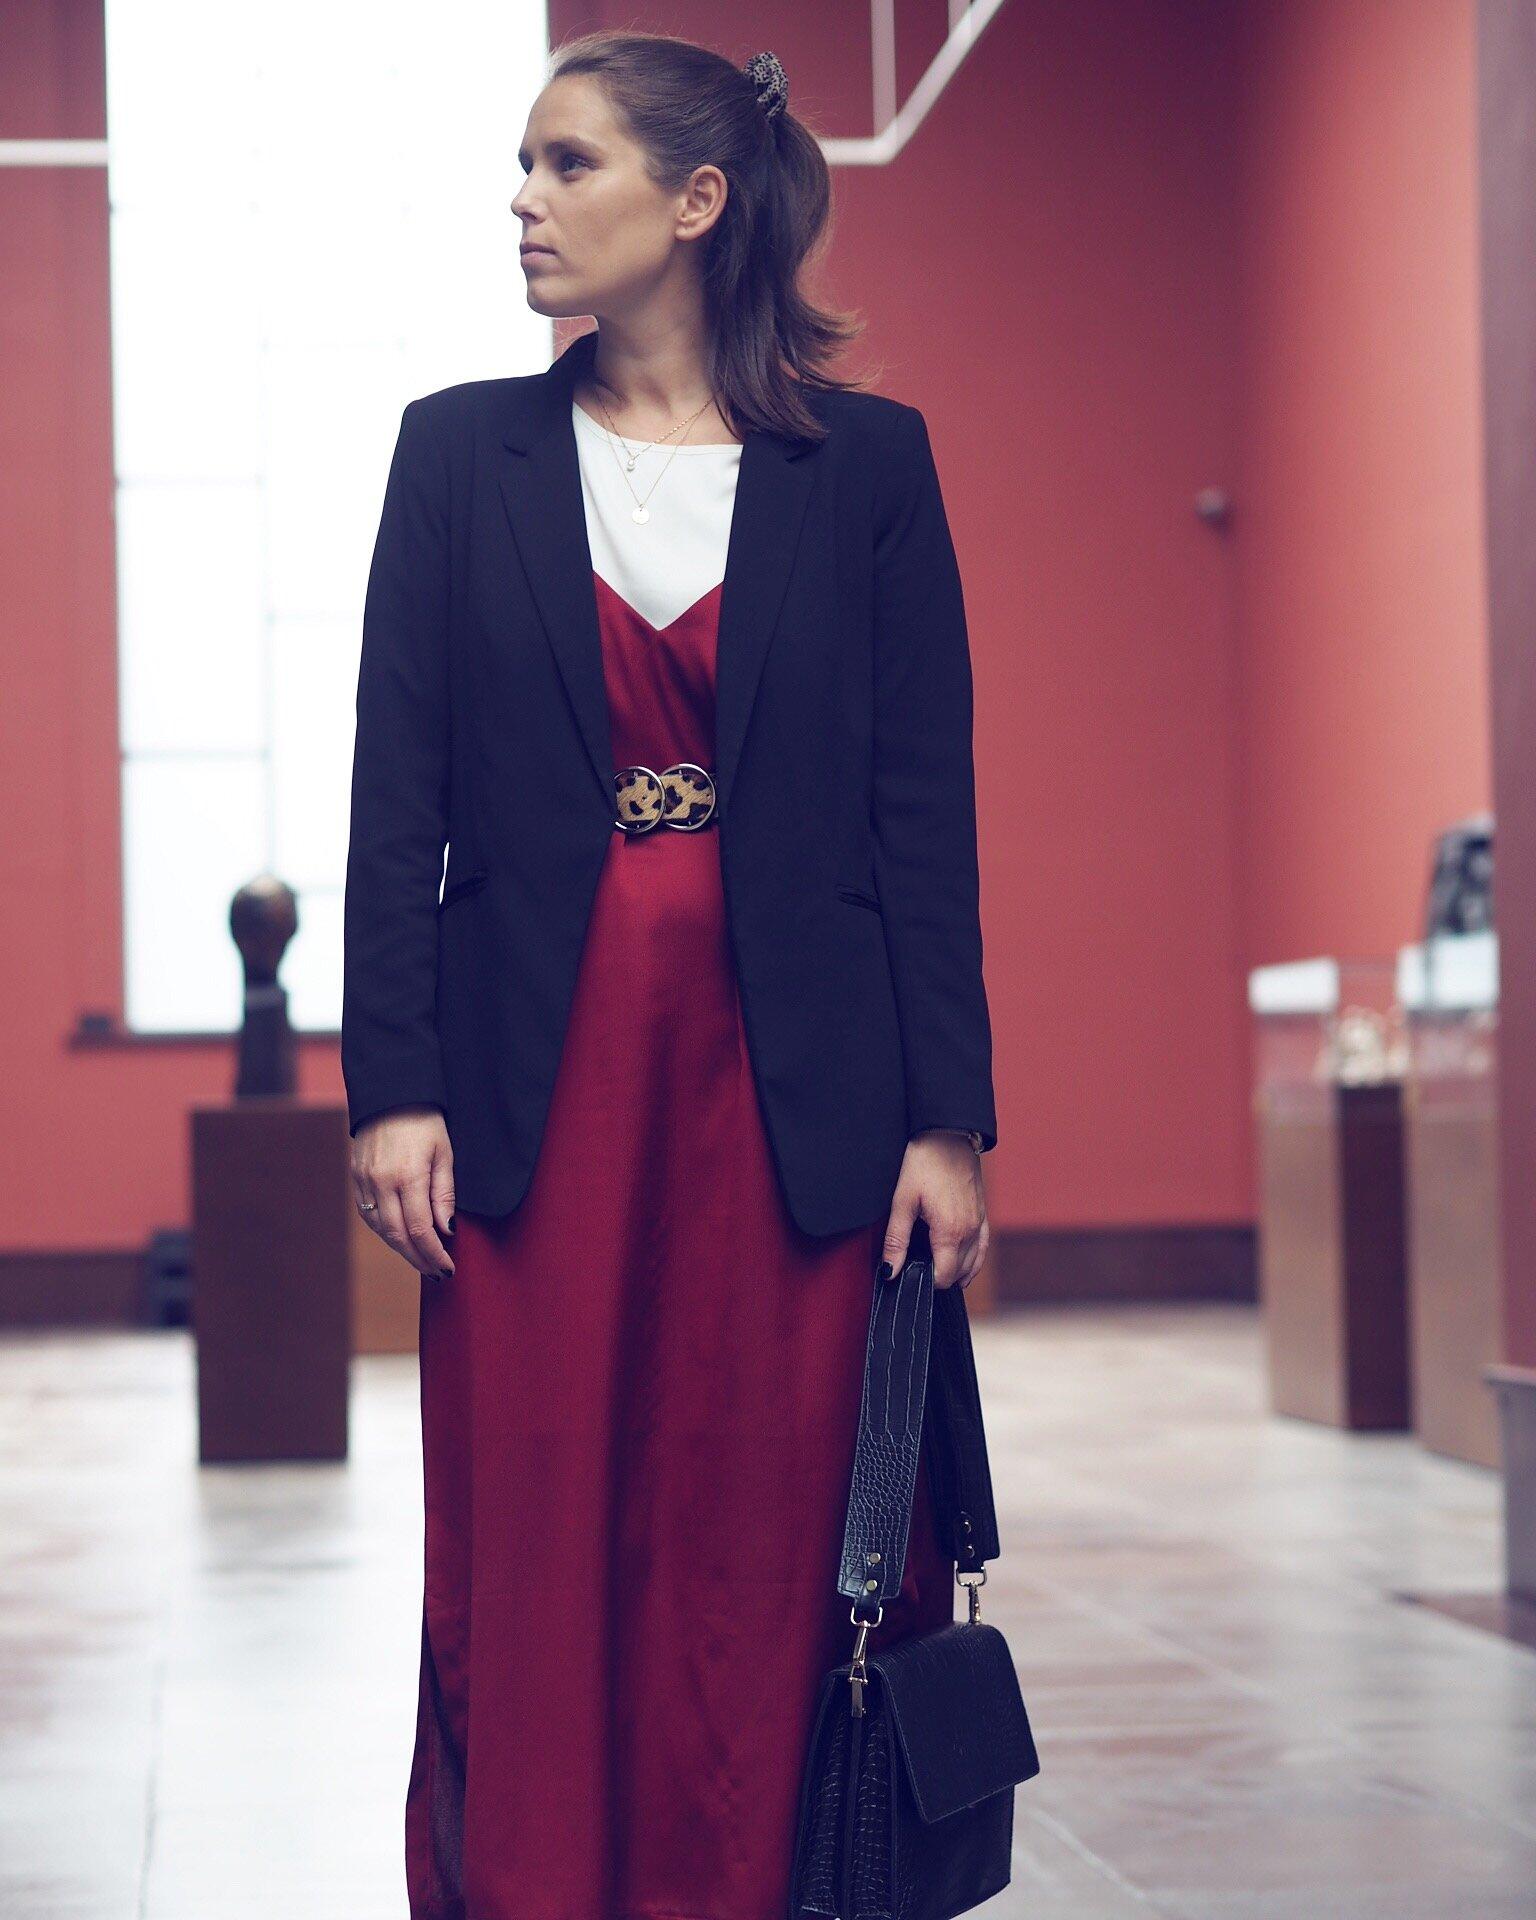 Dress: Lindex - Belt: River Island - Purse: Amica Studios // Photo cred: Nina Isabell Abrahamsen